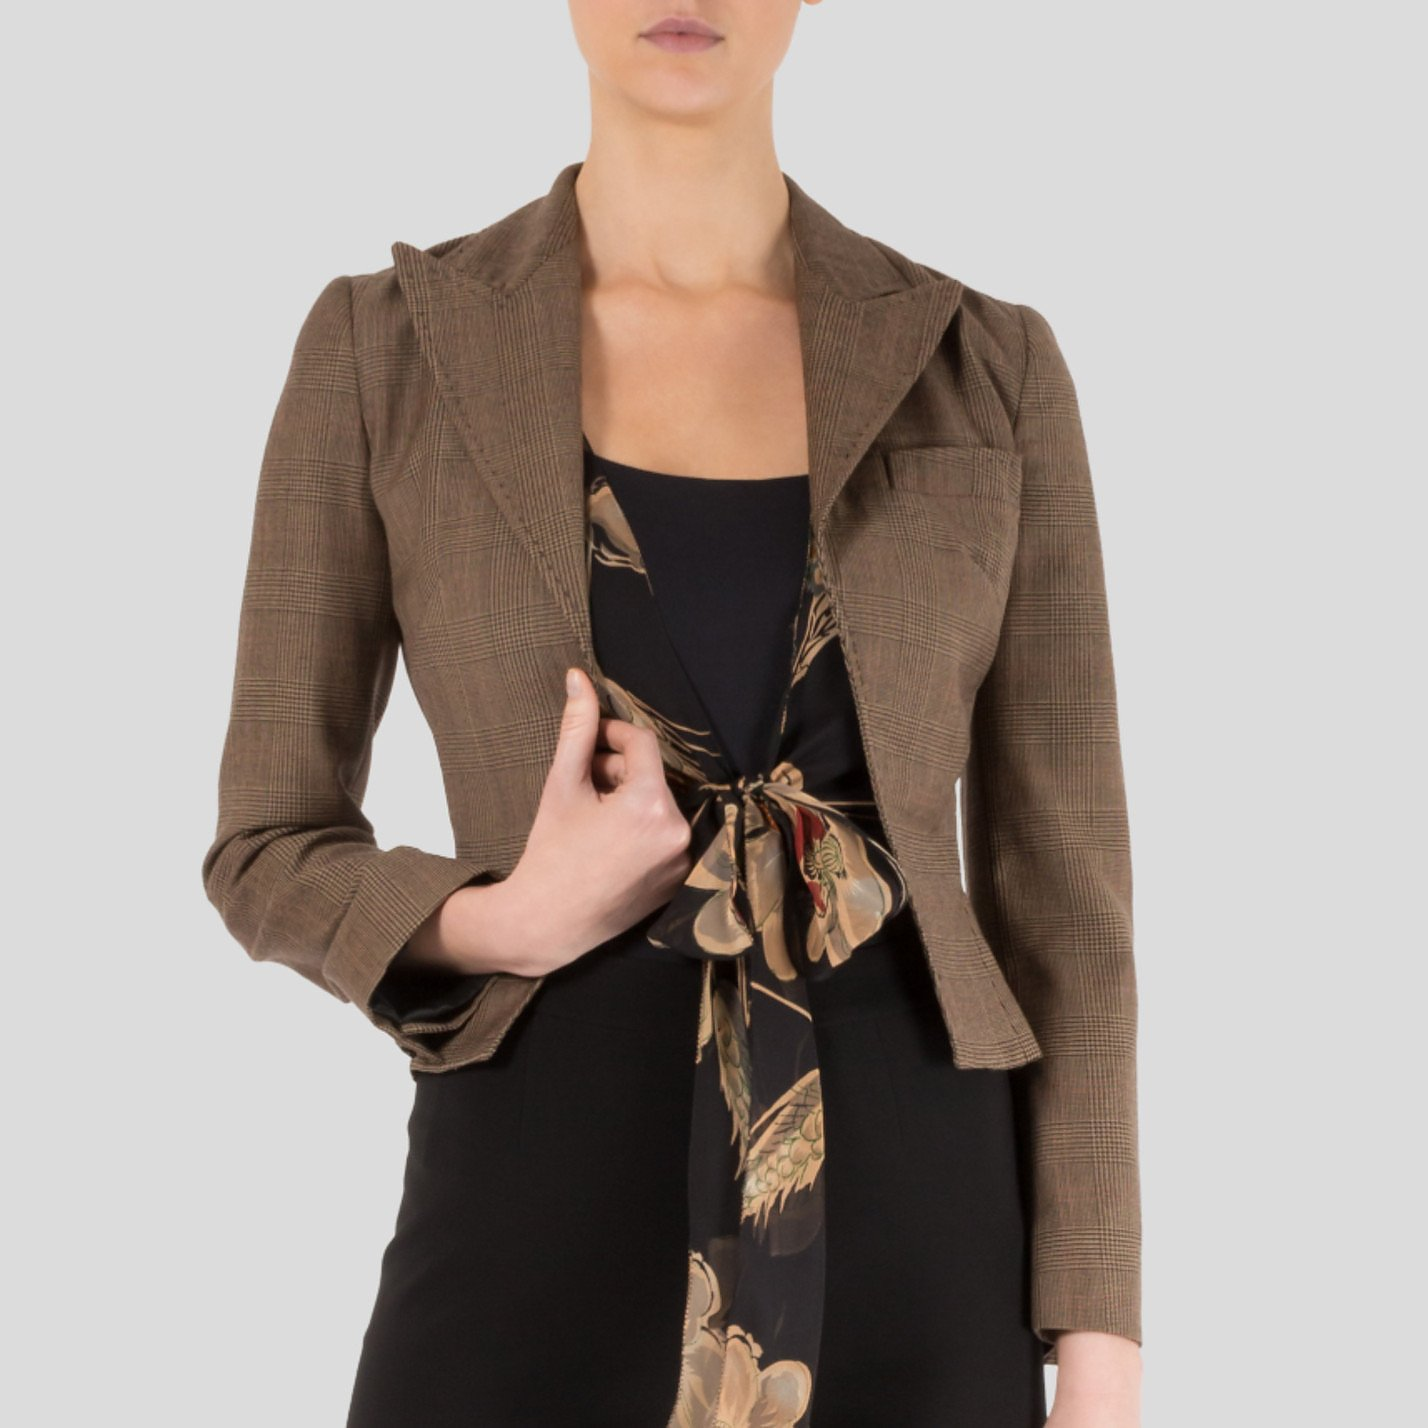 DOLCE & GABBANA Cropped Check Jacket